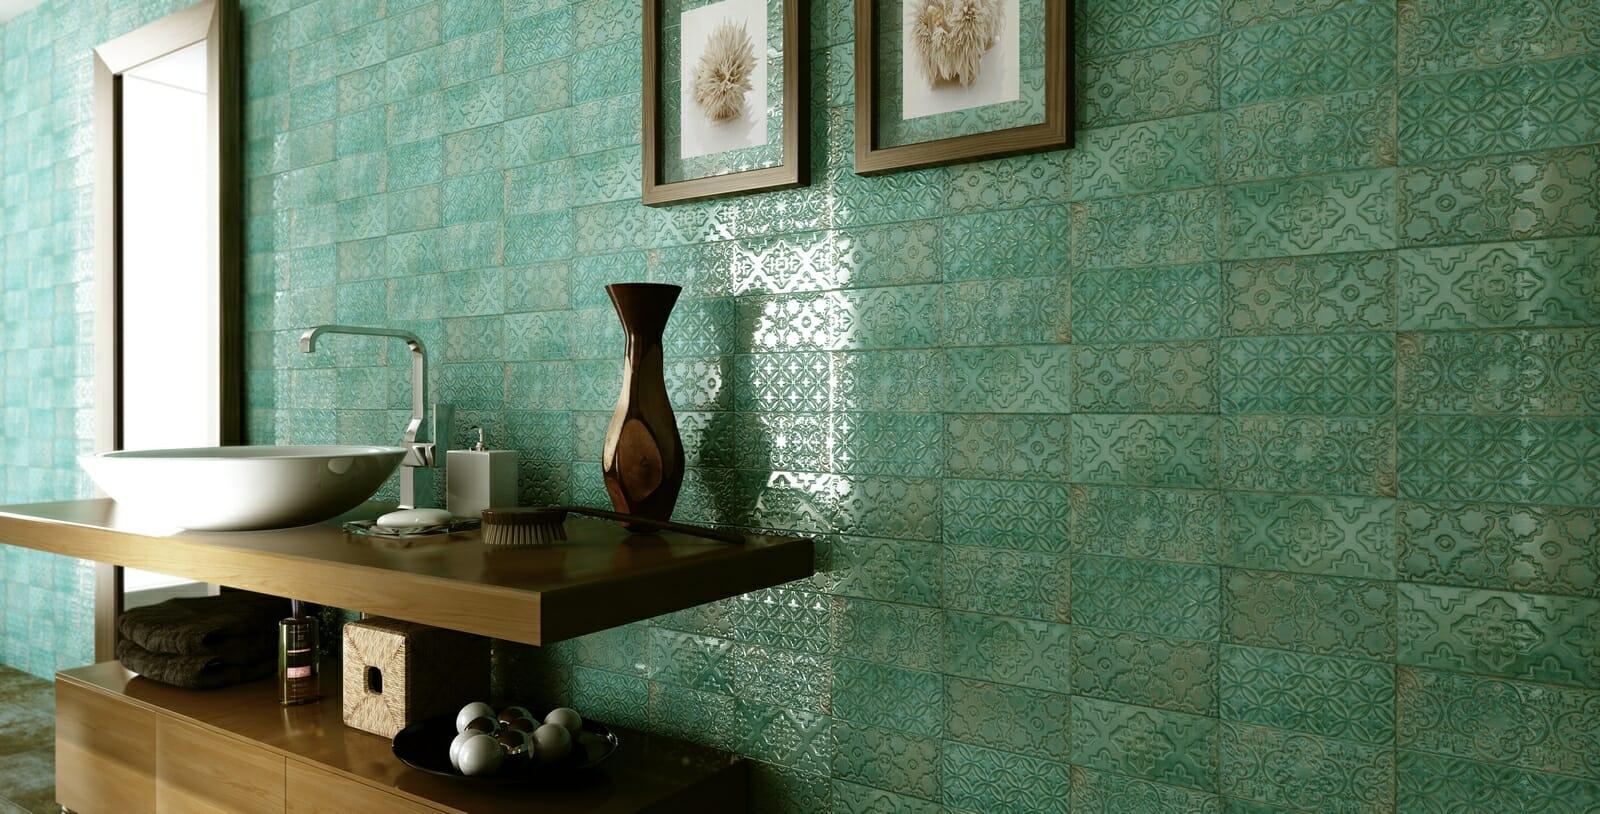 zurburan-esmeralda-green-moroccan-patterned